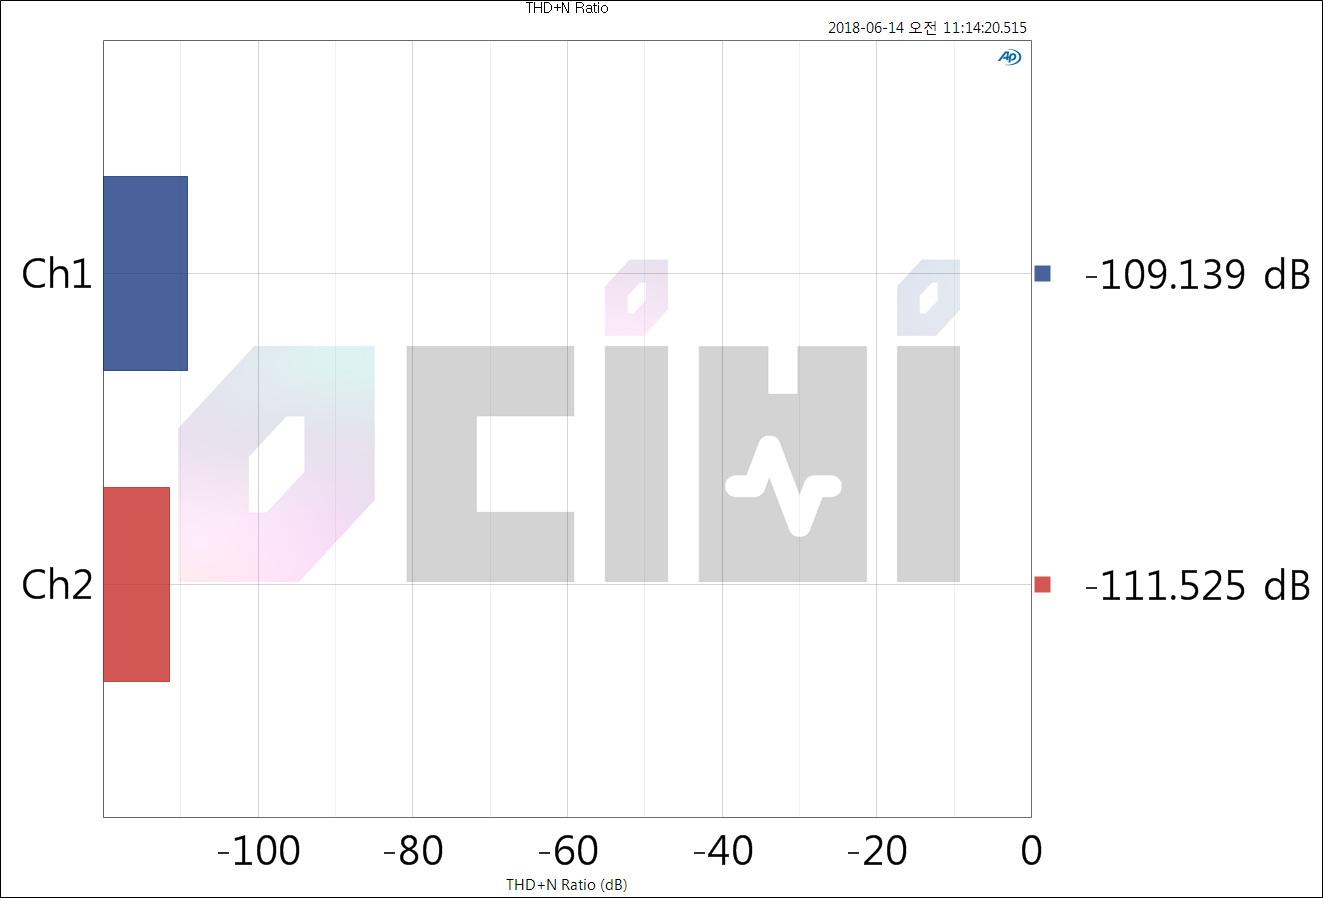 070 THD+N Ratio.jpg